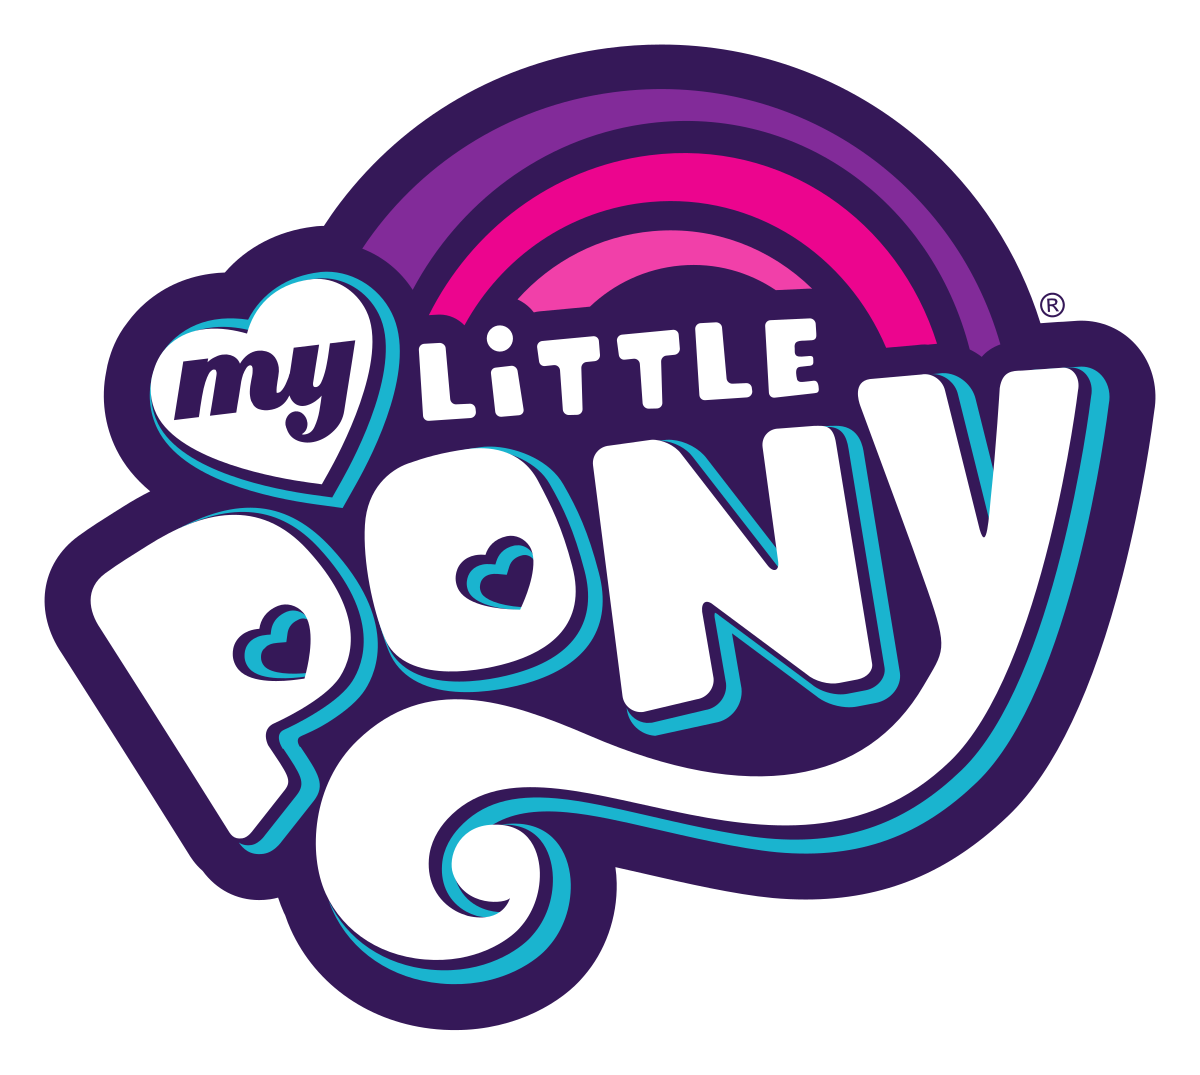 My_Little_Pony_G4_logo.png